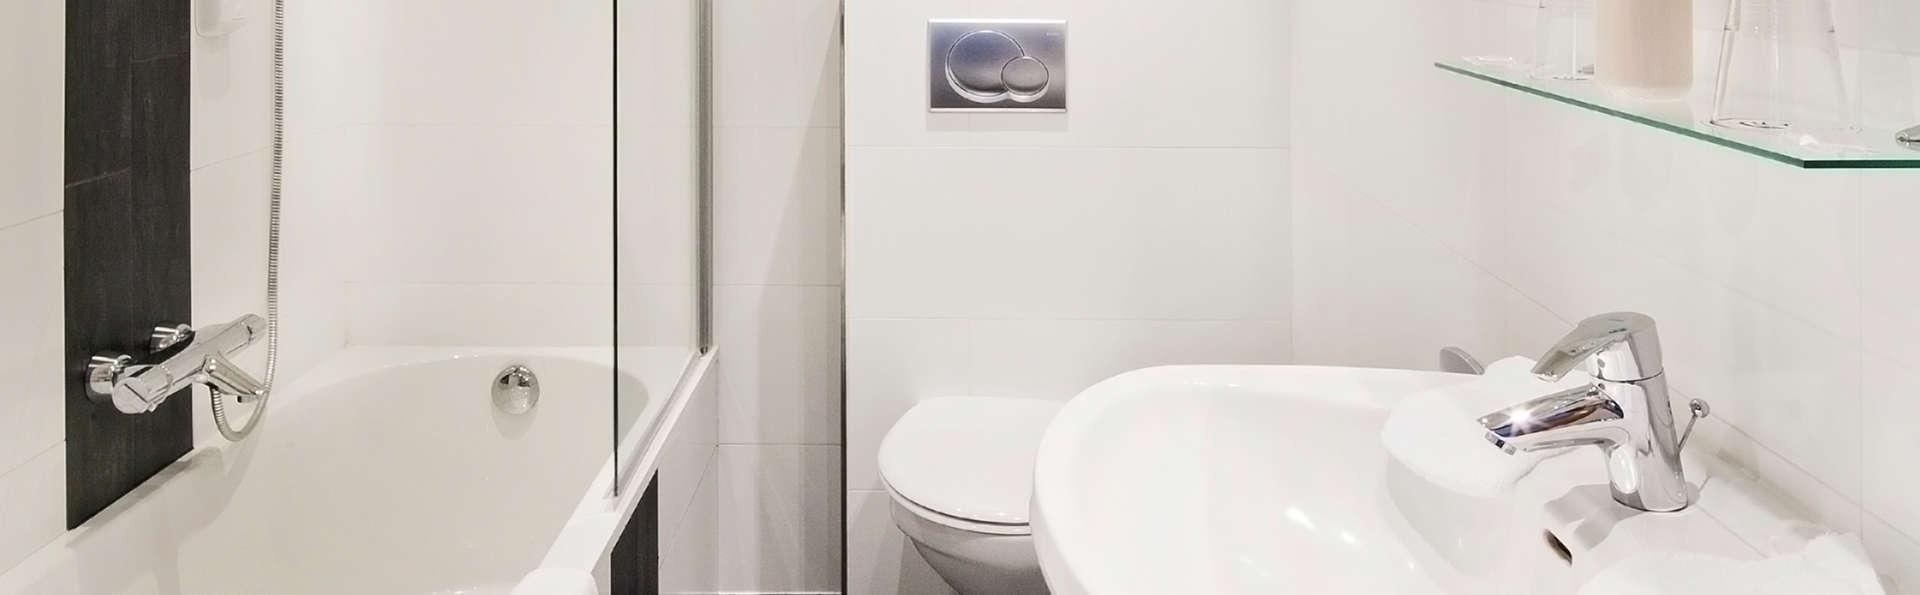 Auberge de la Gaichel - EDIT_bath1.jpg